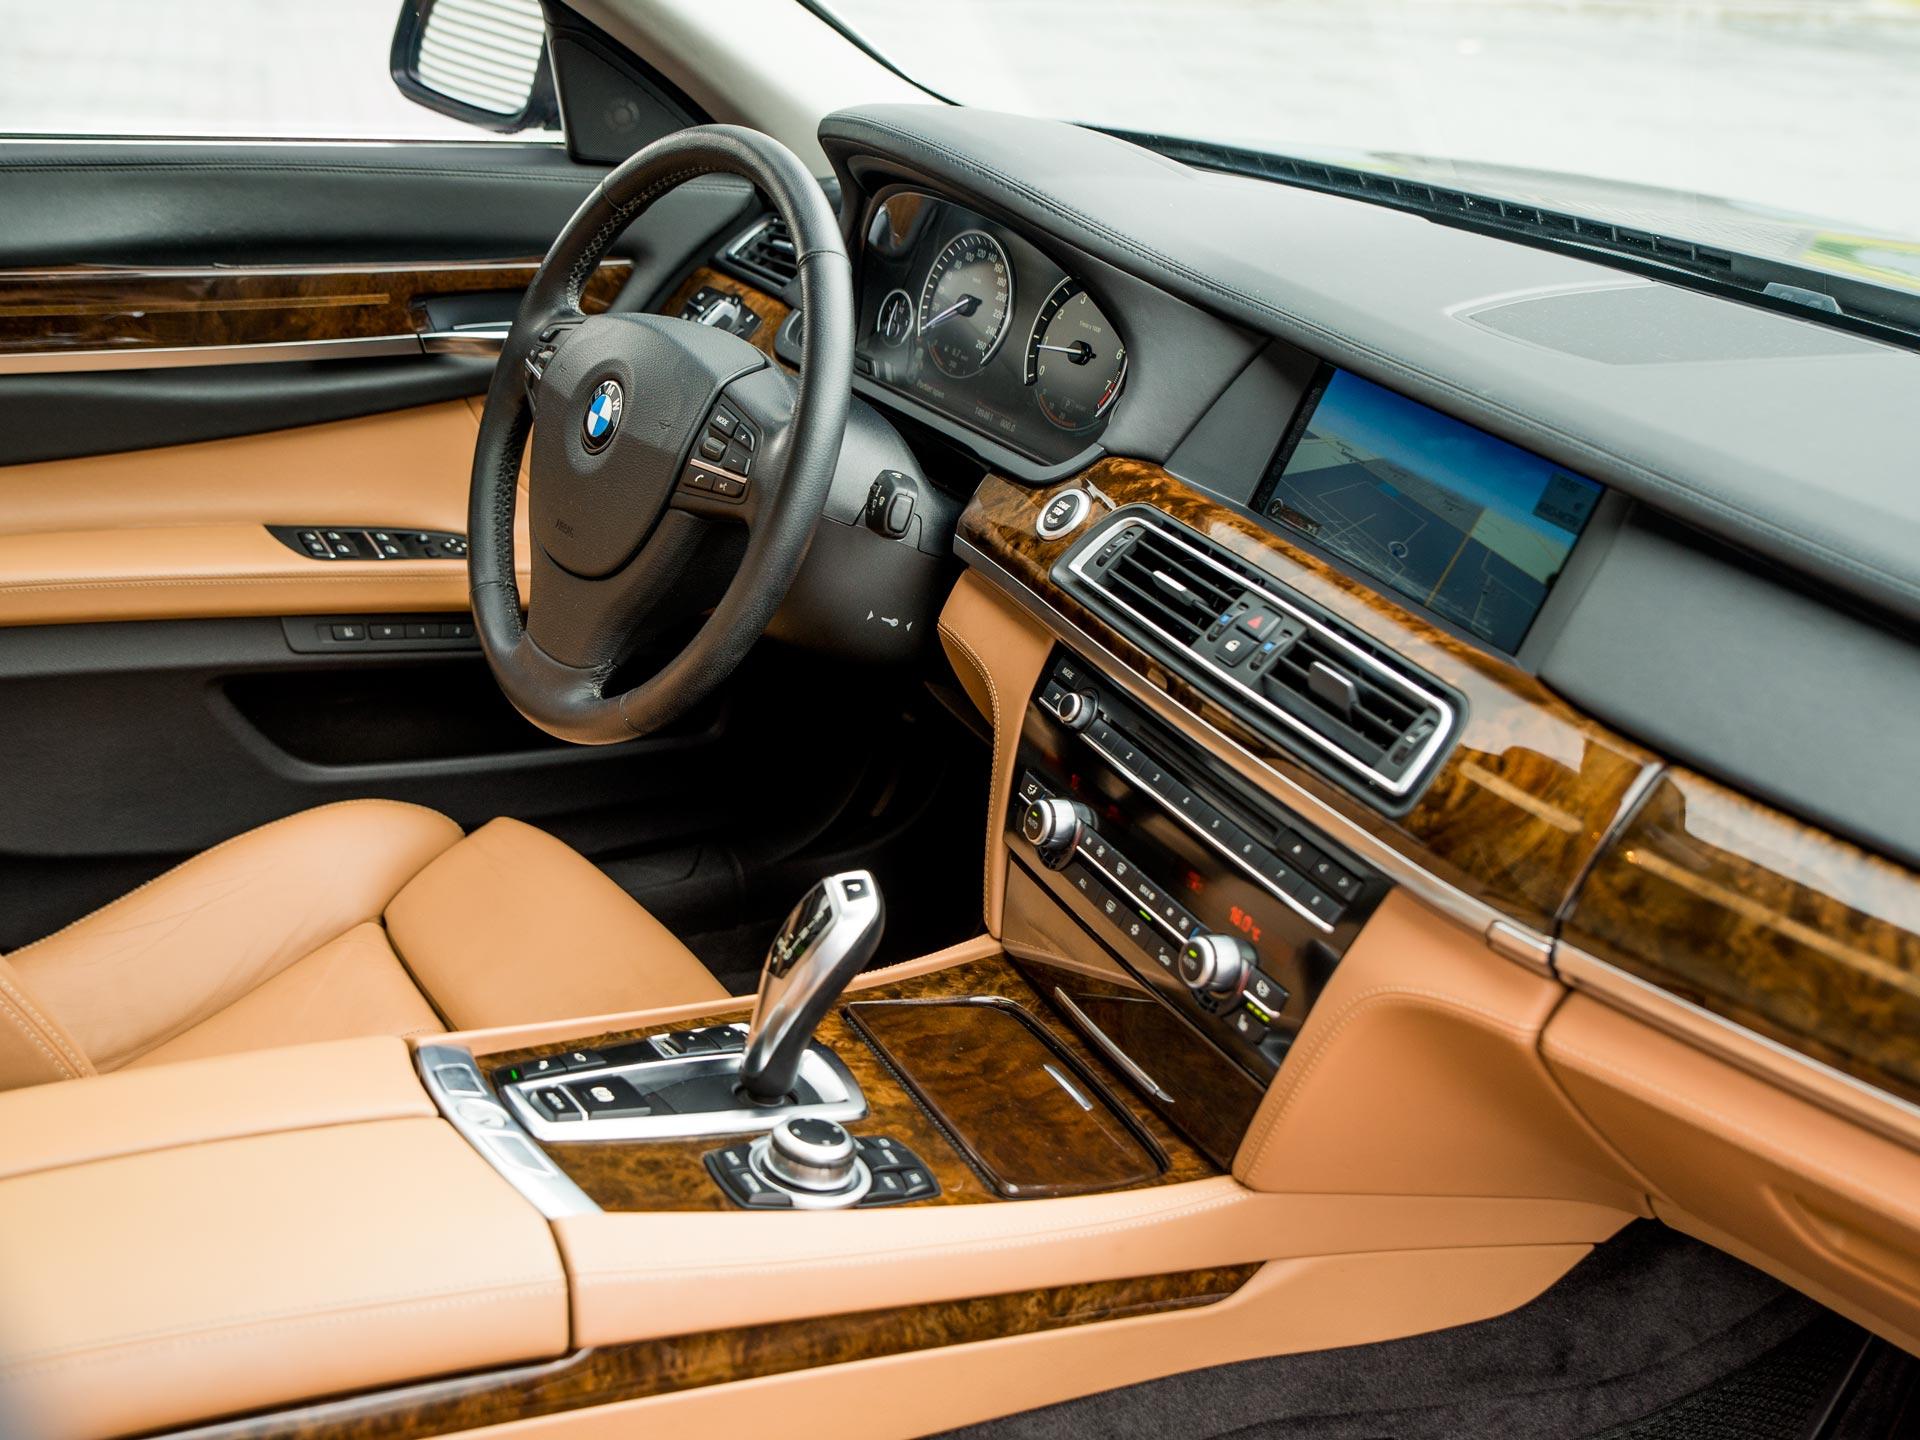 Tweedehands BMW 7 Serie 760i occasion